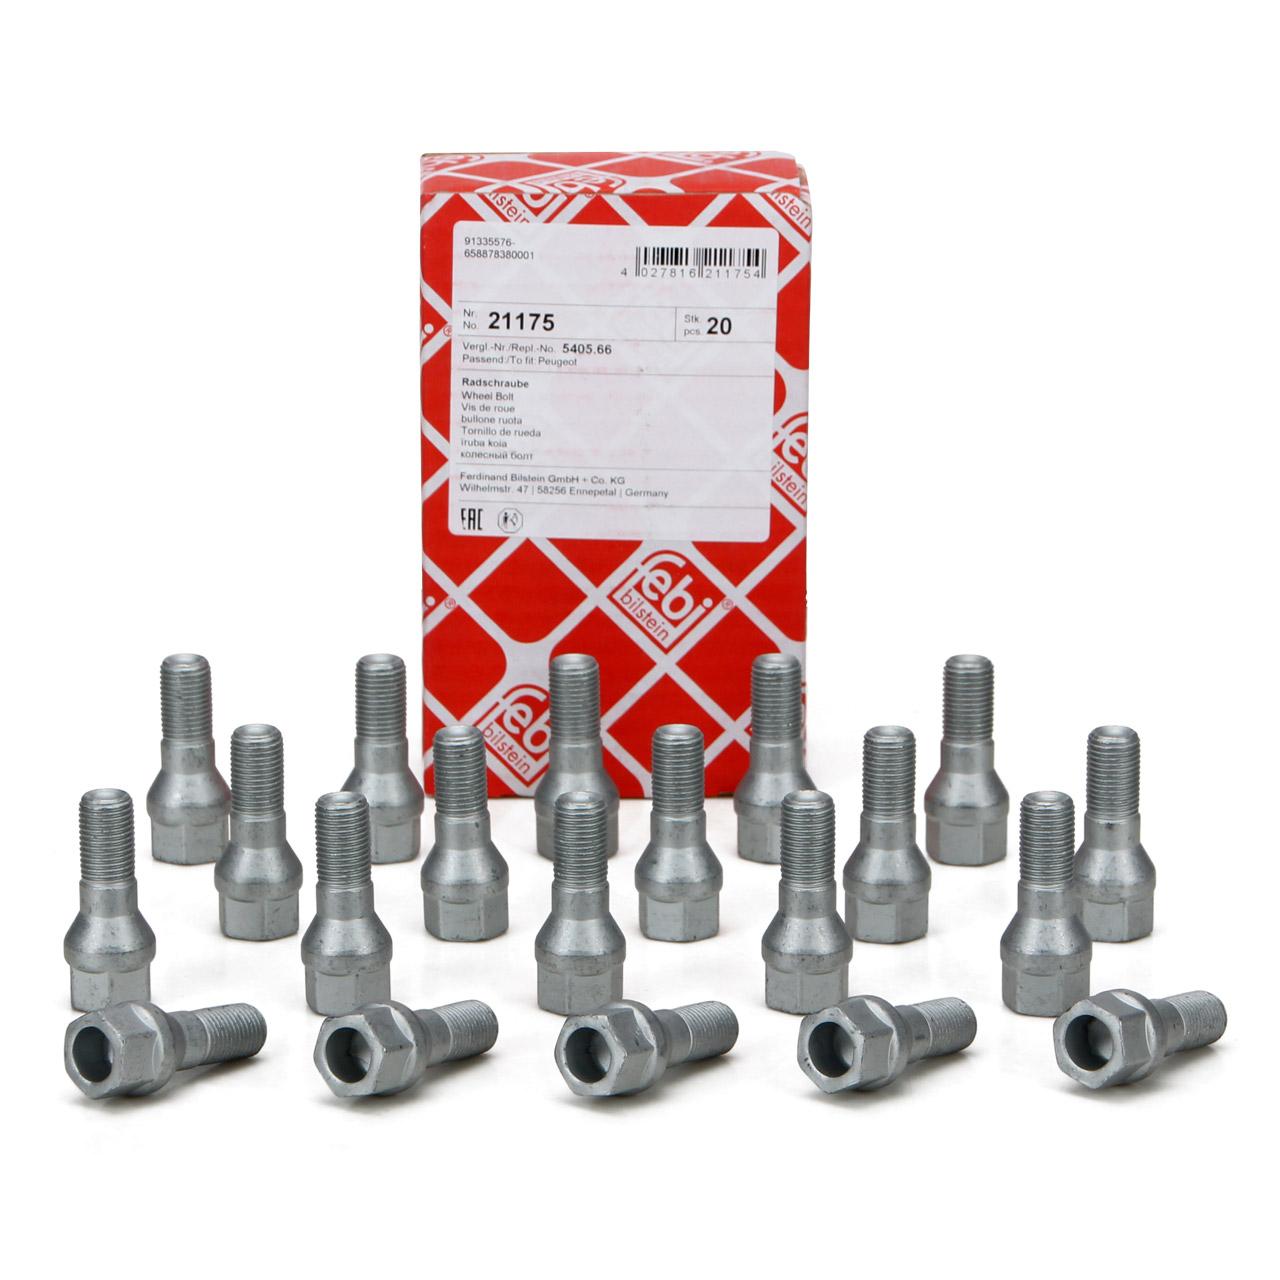 20x FEBI 21175 Radbolzen Radschrauben M12x1,25mm 47mm für CITROEN FIAT PEUGEOT